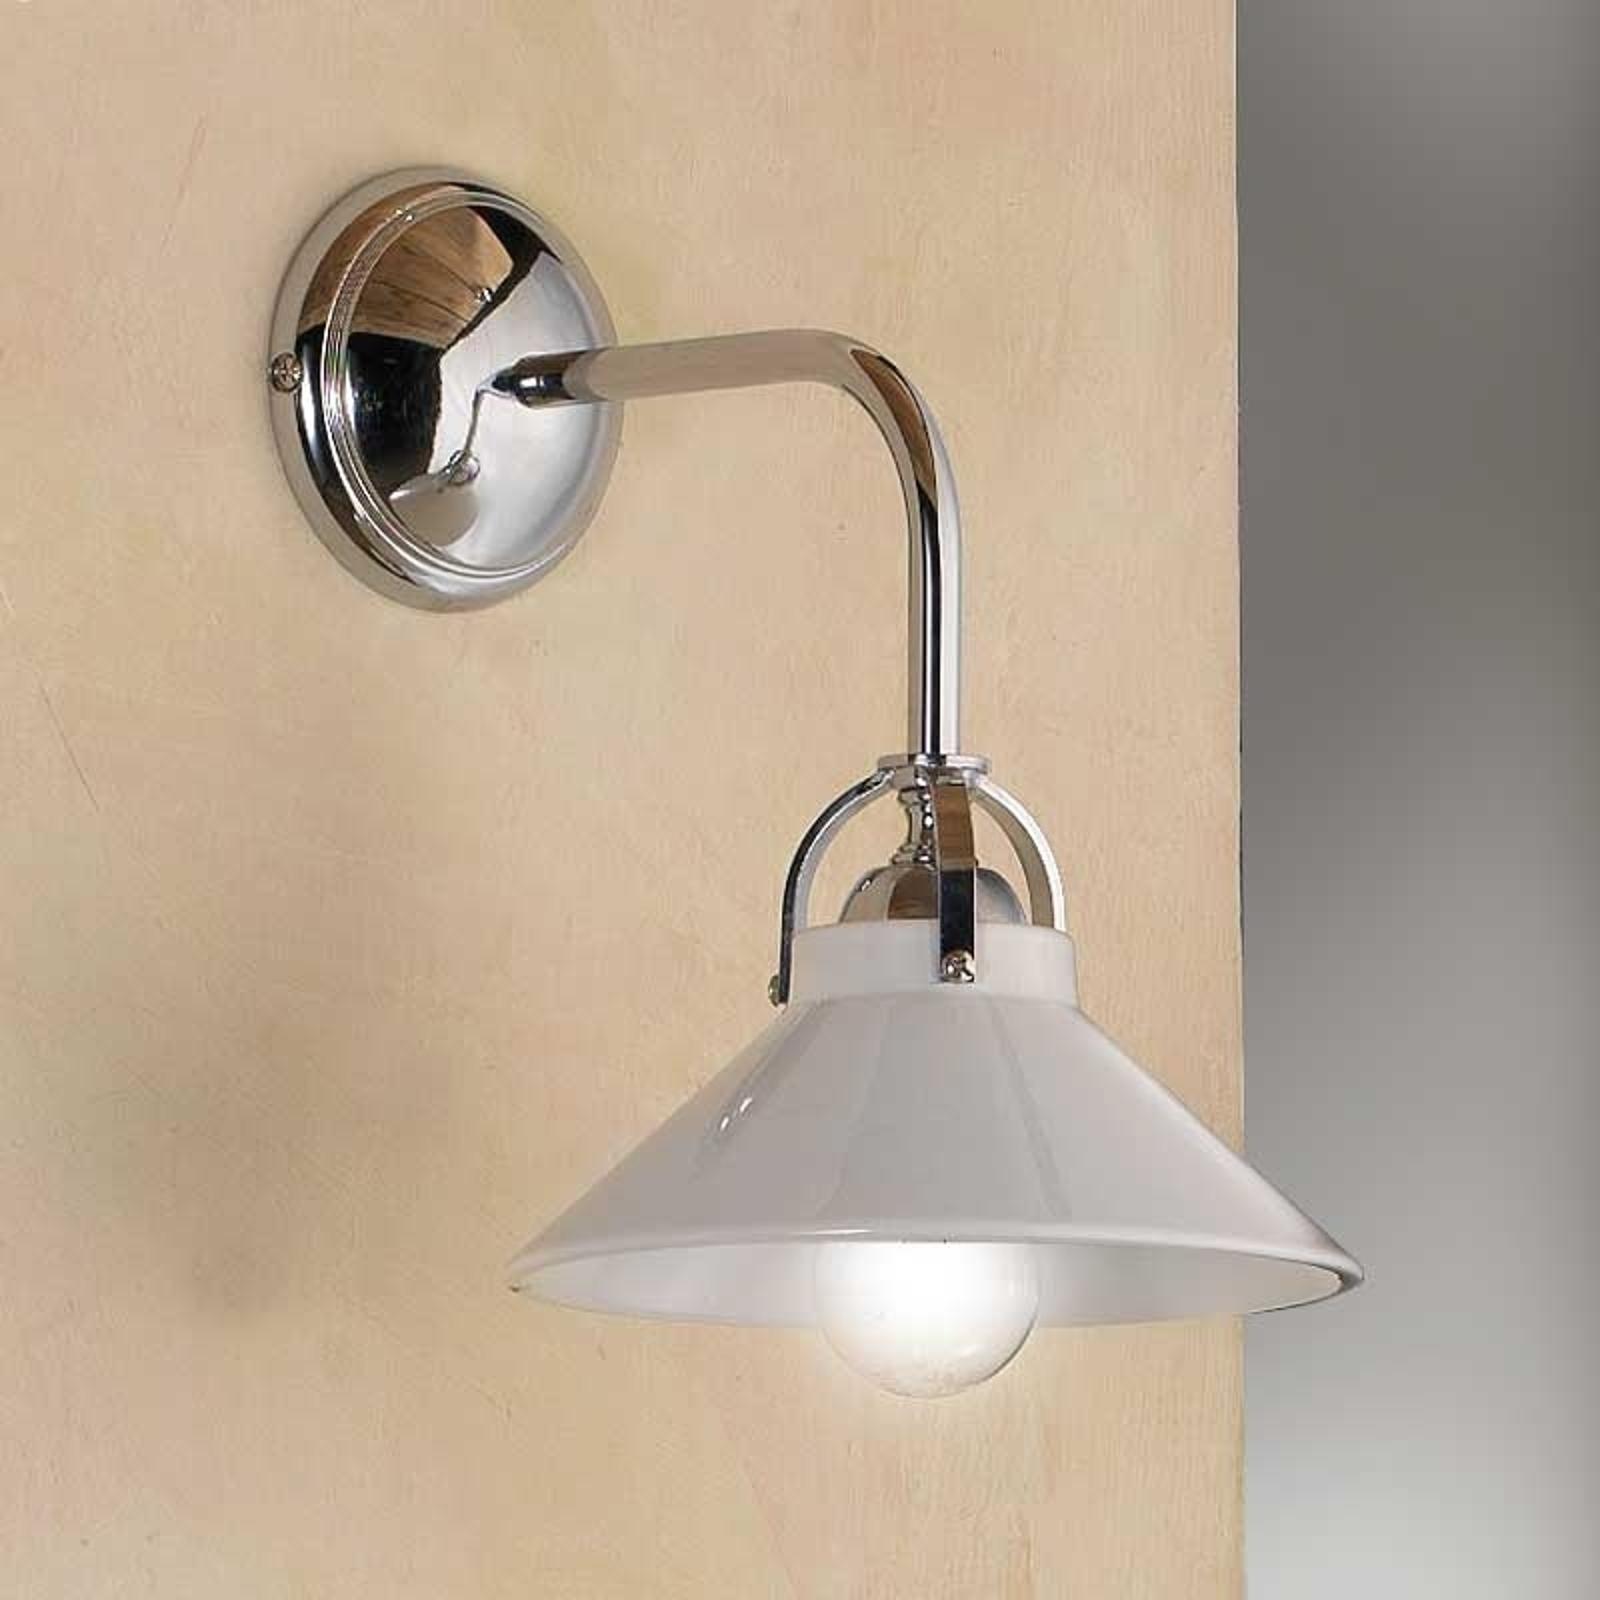 GIACOMO wall light with a ceramic lampshade_2013095_1